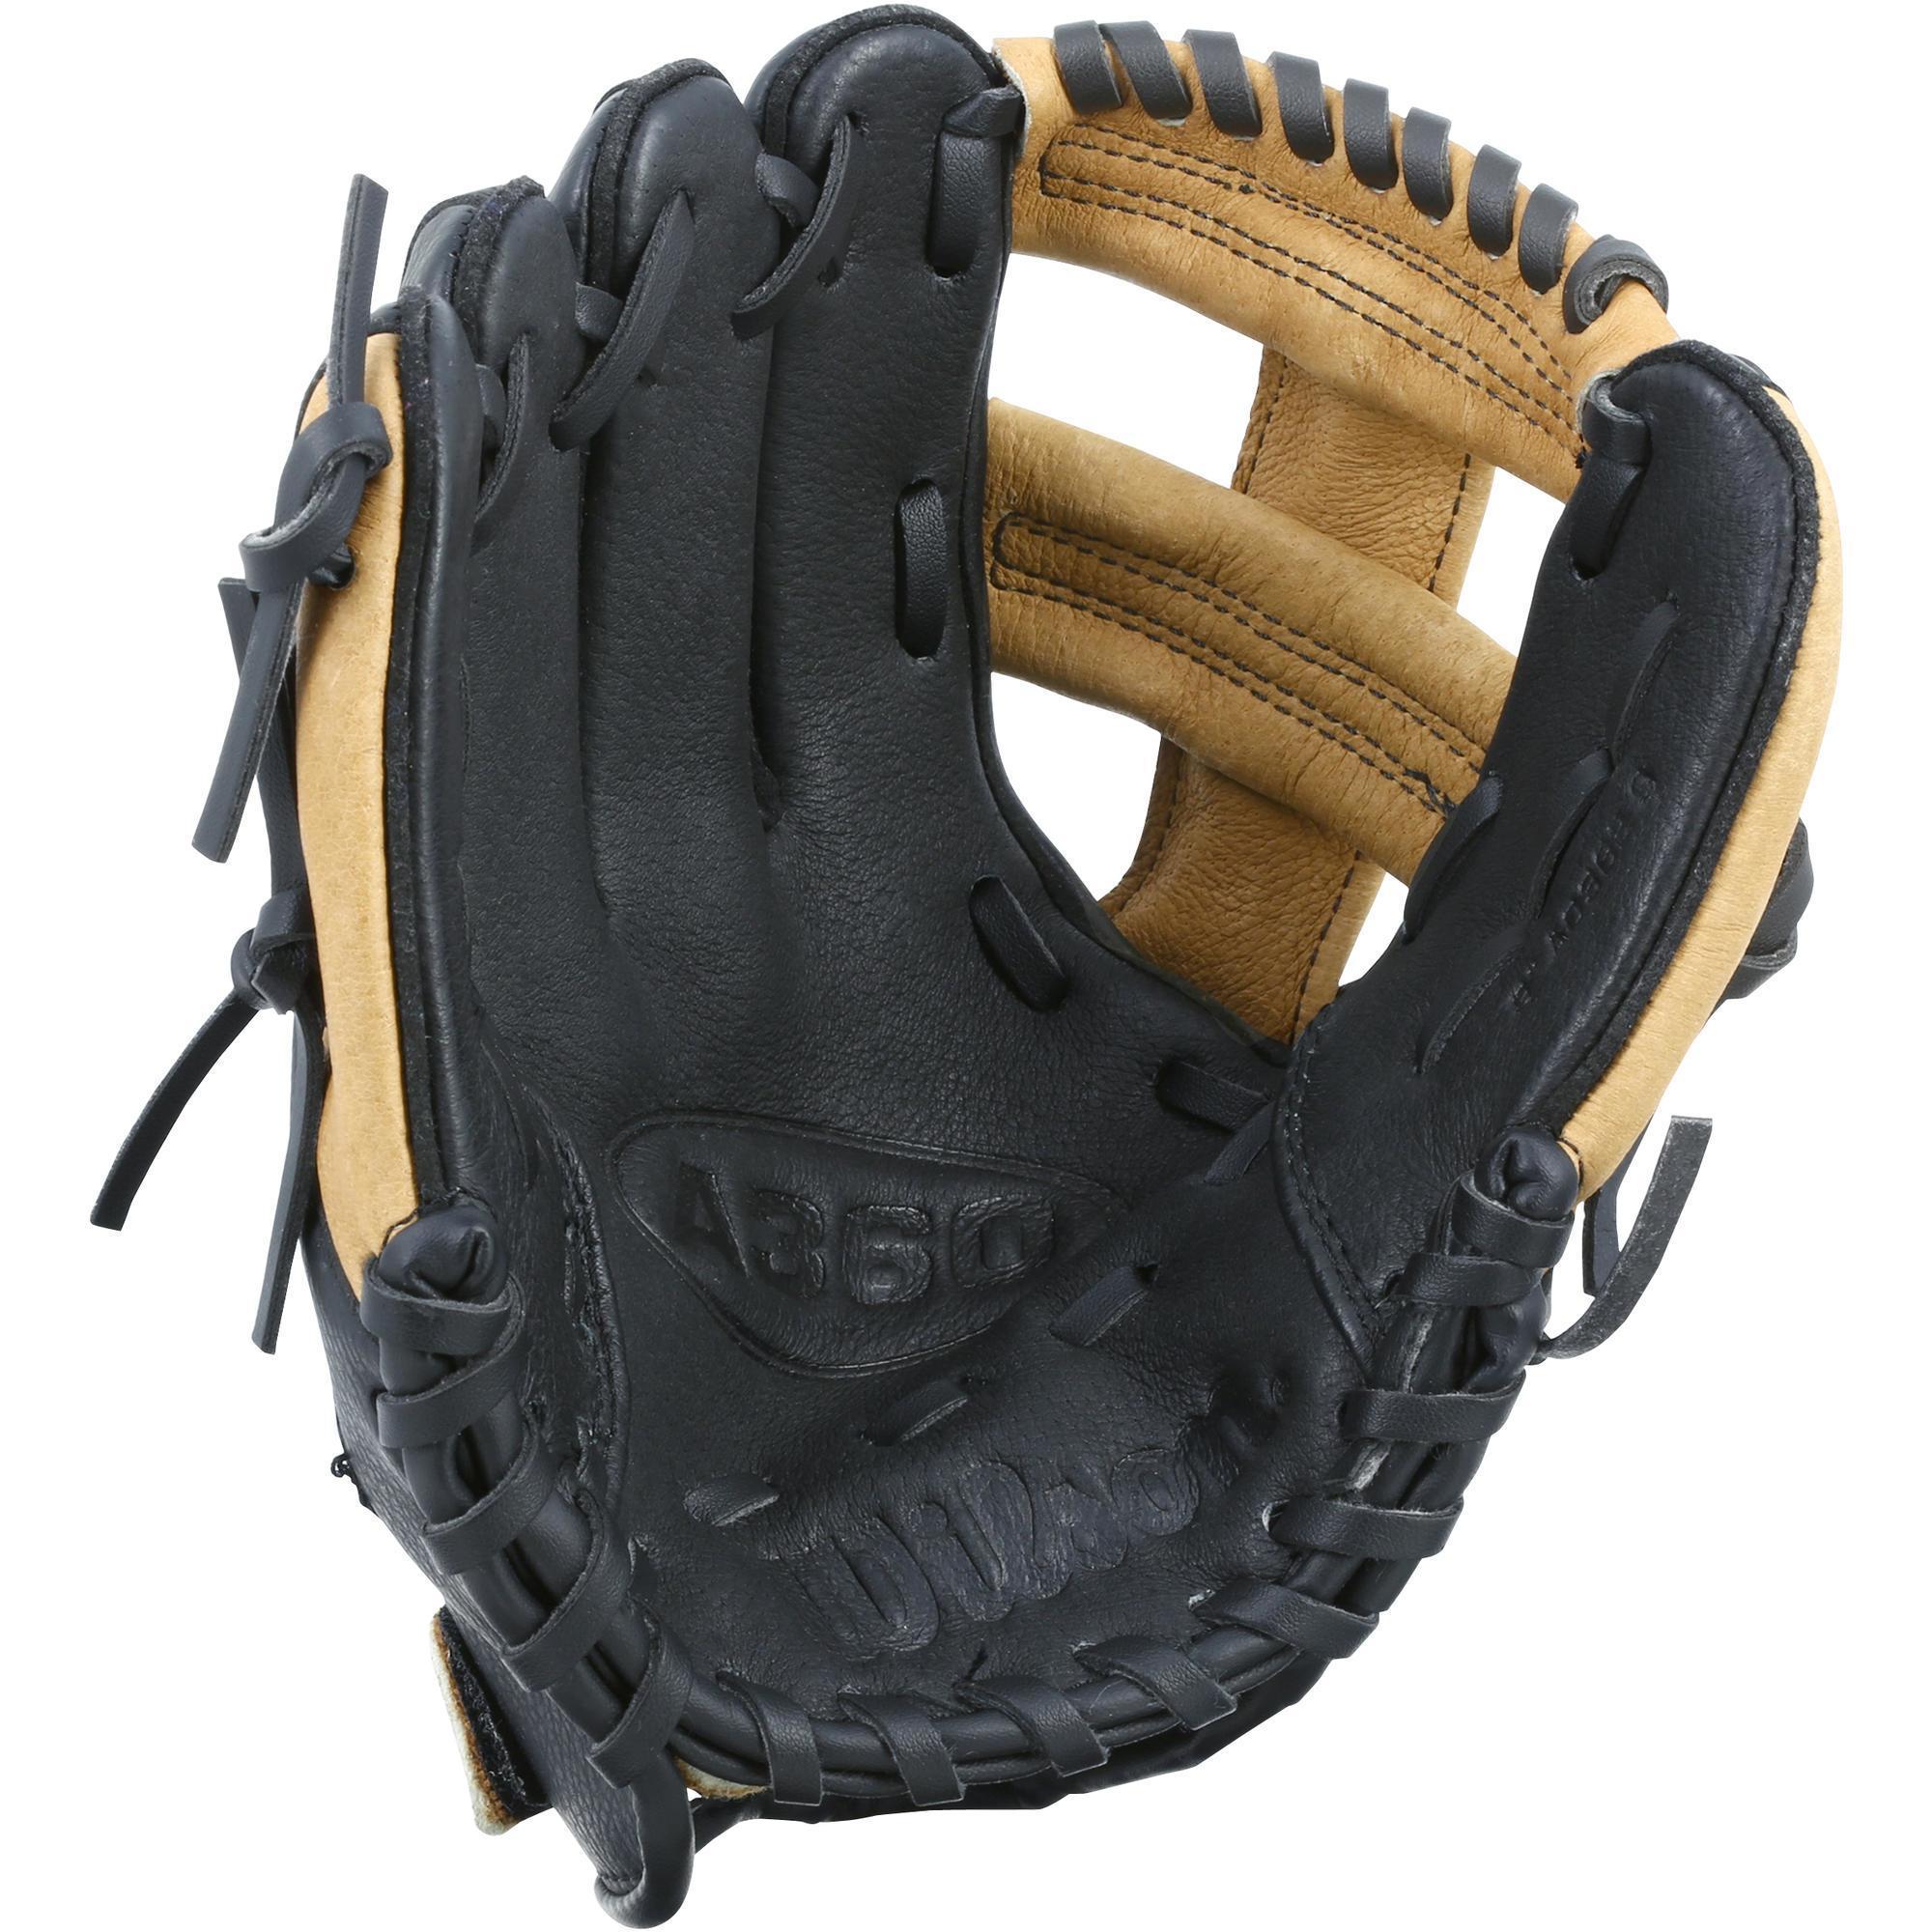 637b0b52743a7 Comprar Pelotas y Bates de Beísbol y Softball